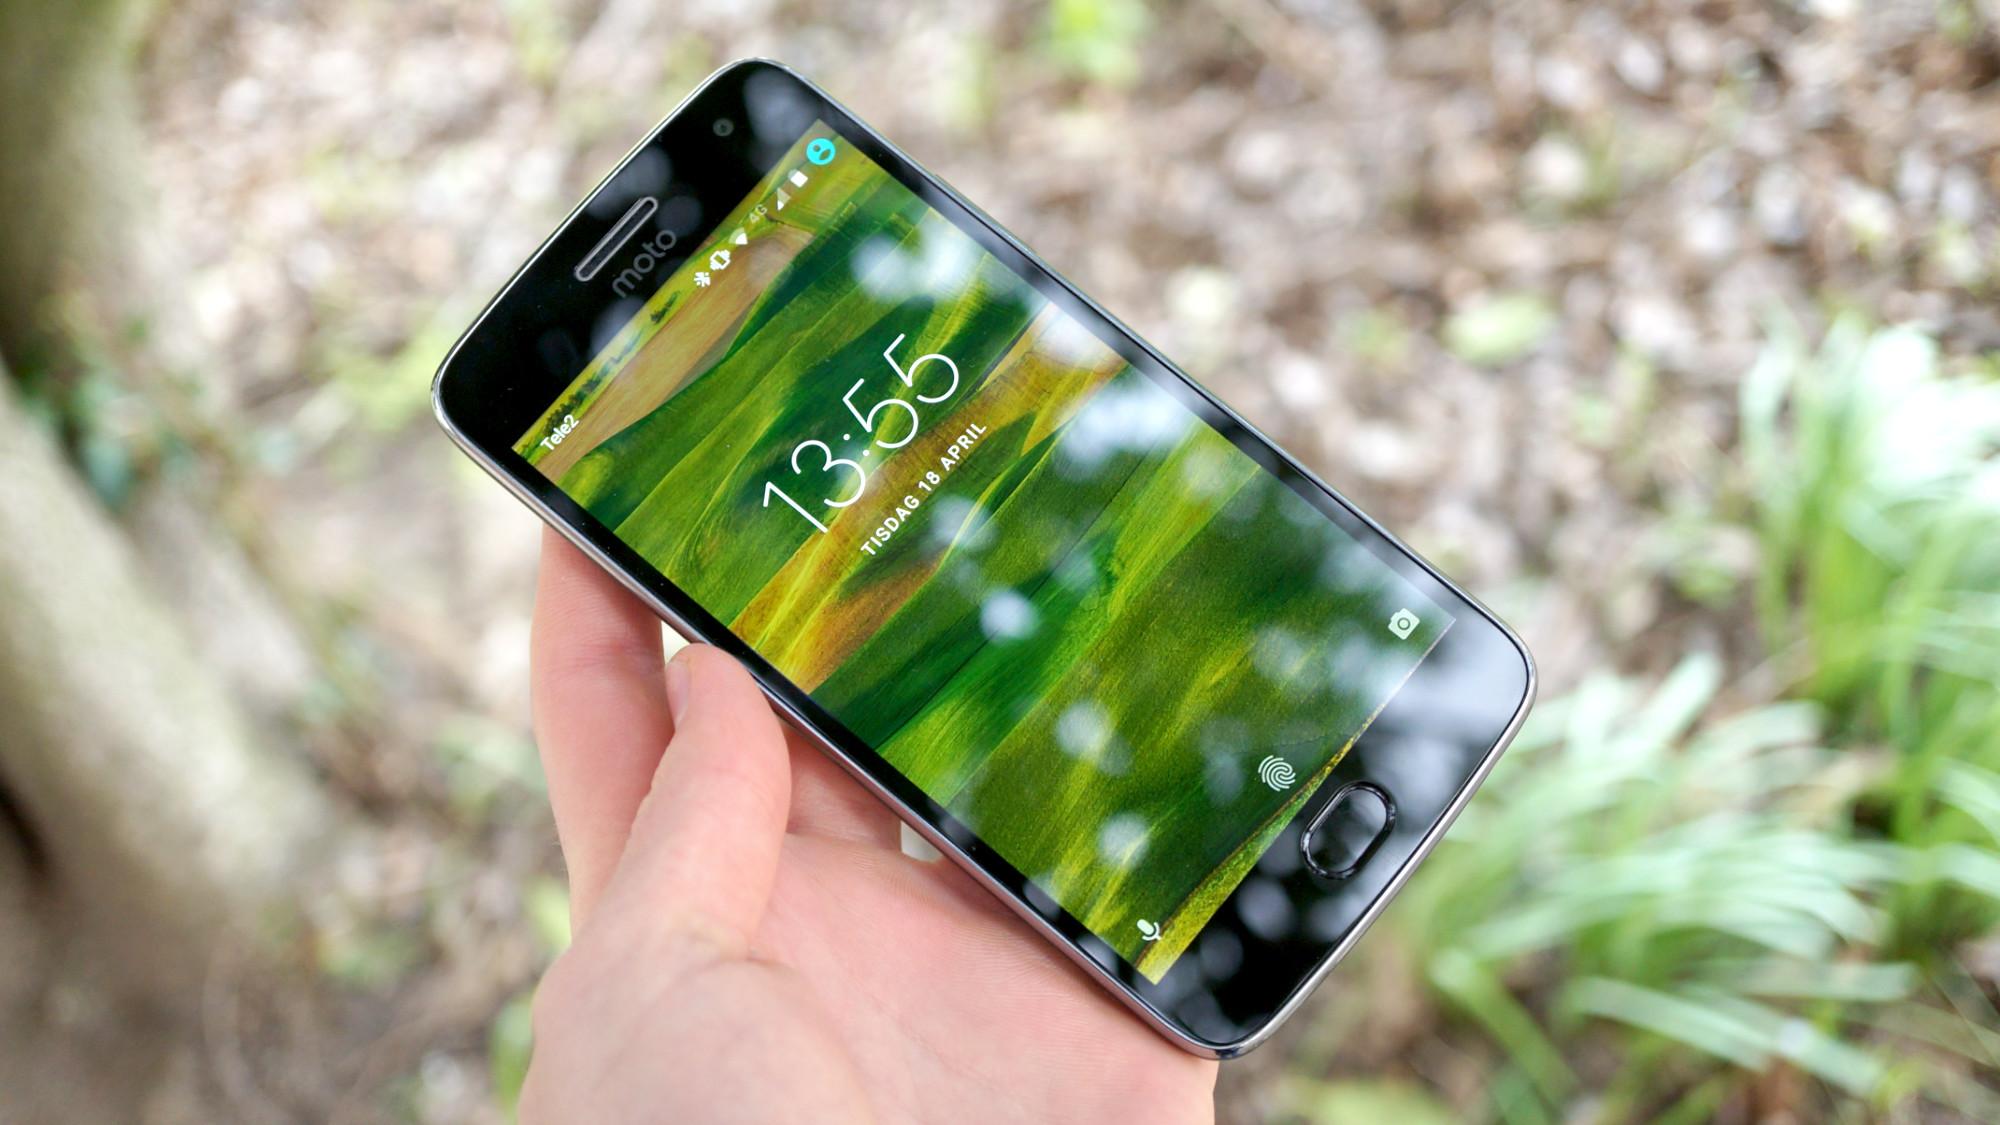 bästa mobilen under 3000 kr